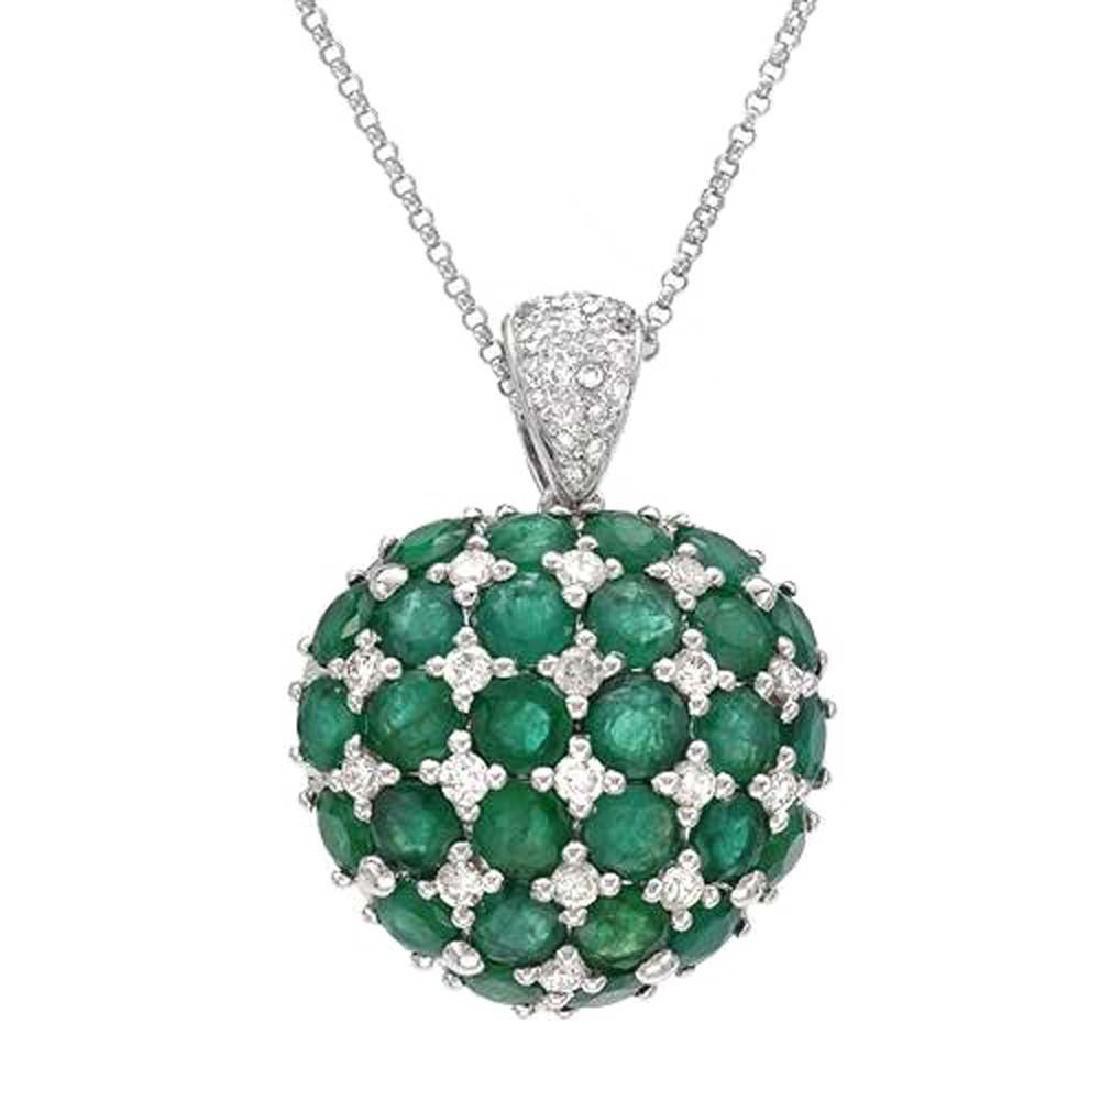 7.99 CTW Emerald Slider Necklace in 14K White Gold